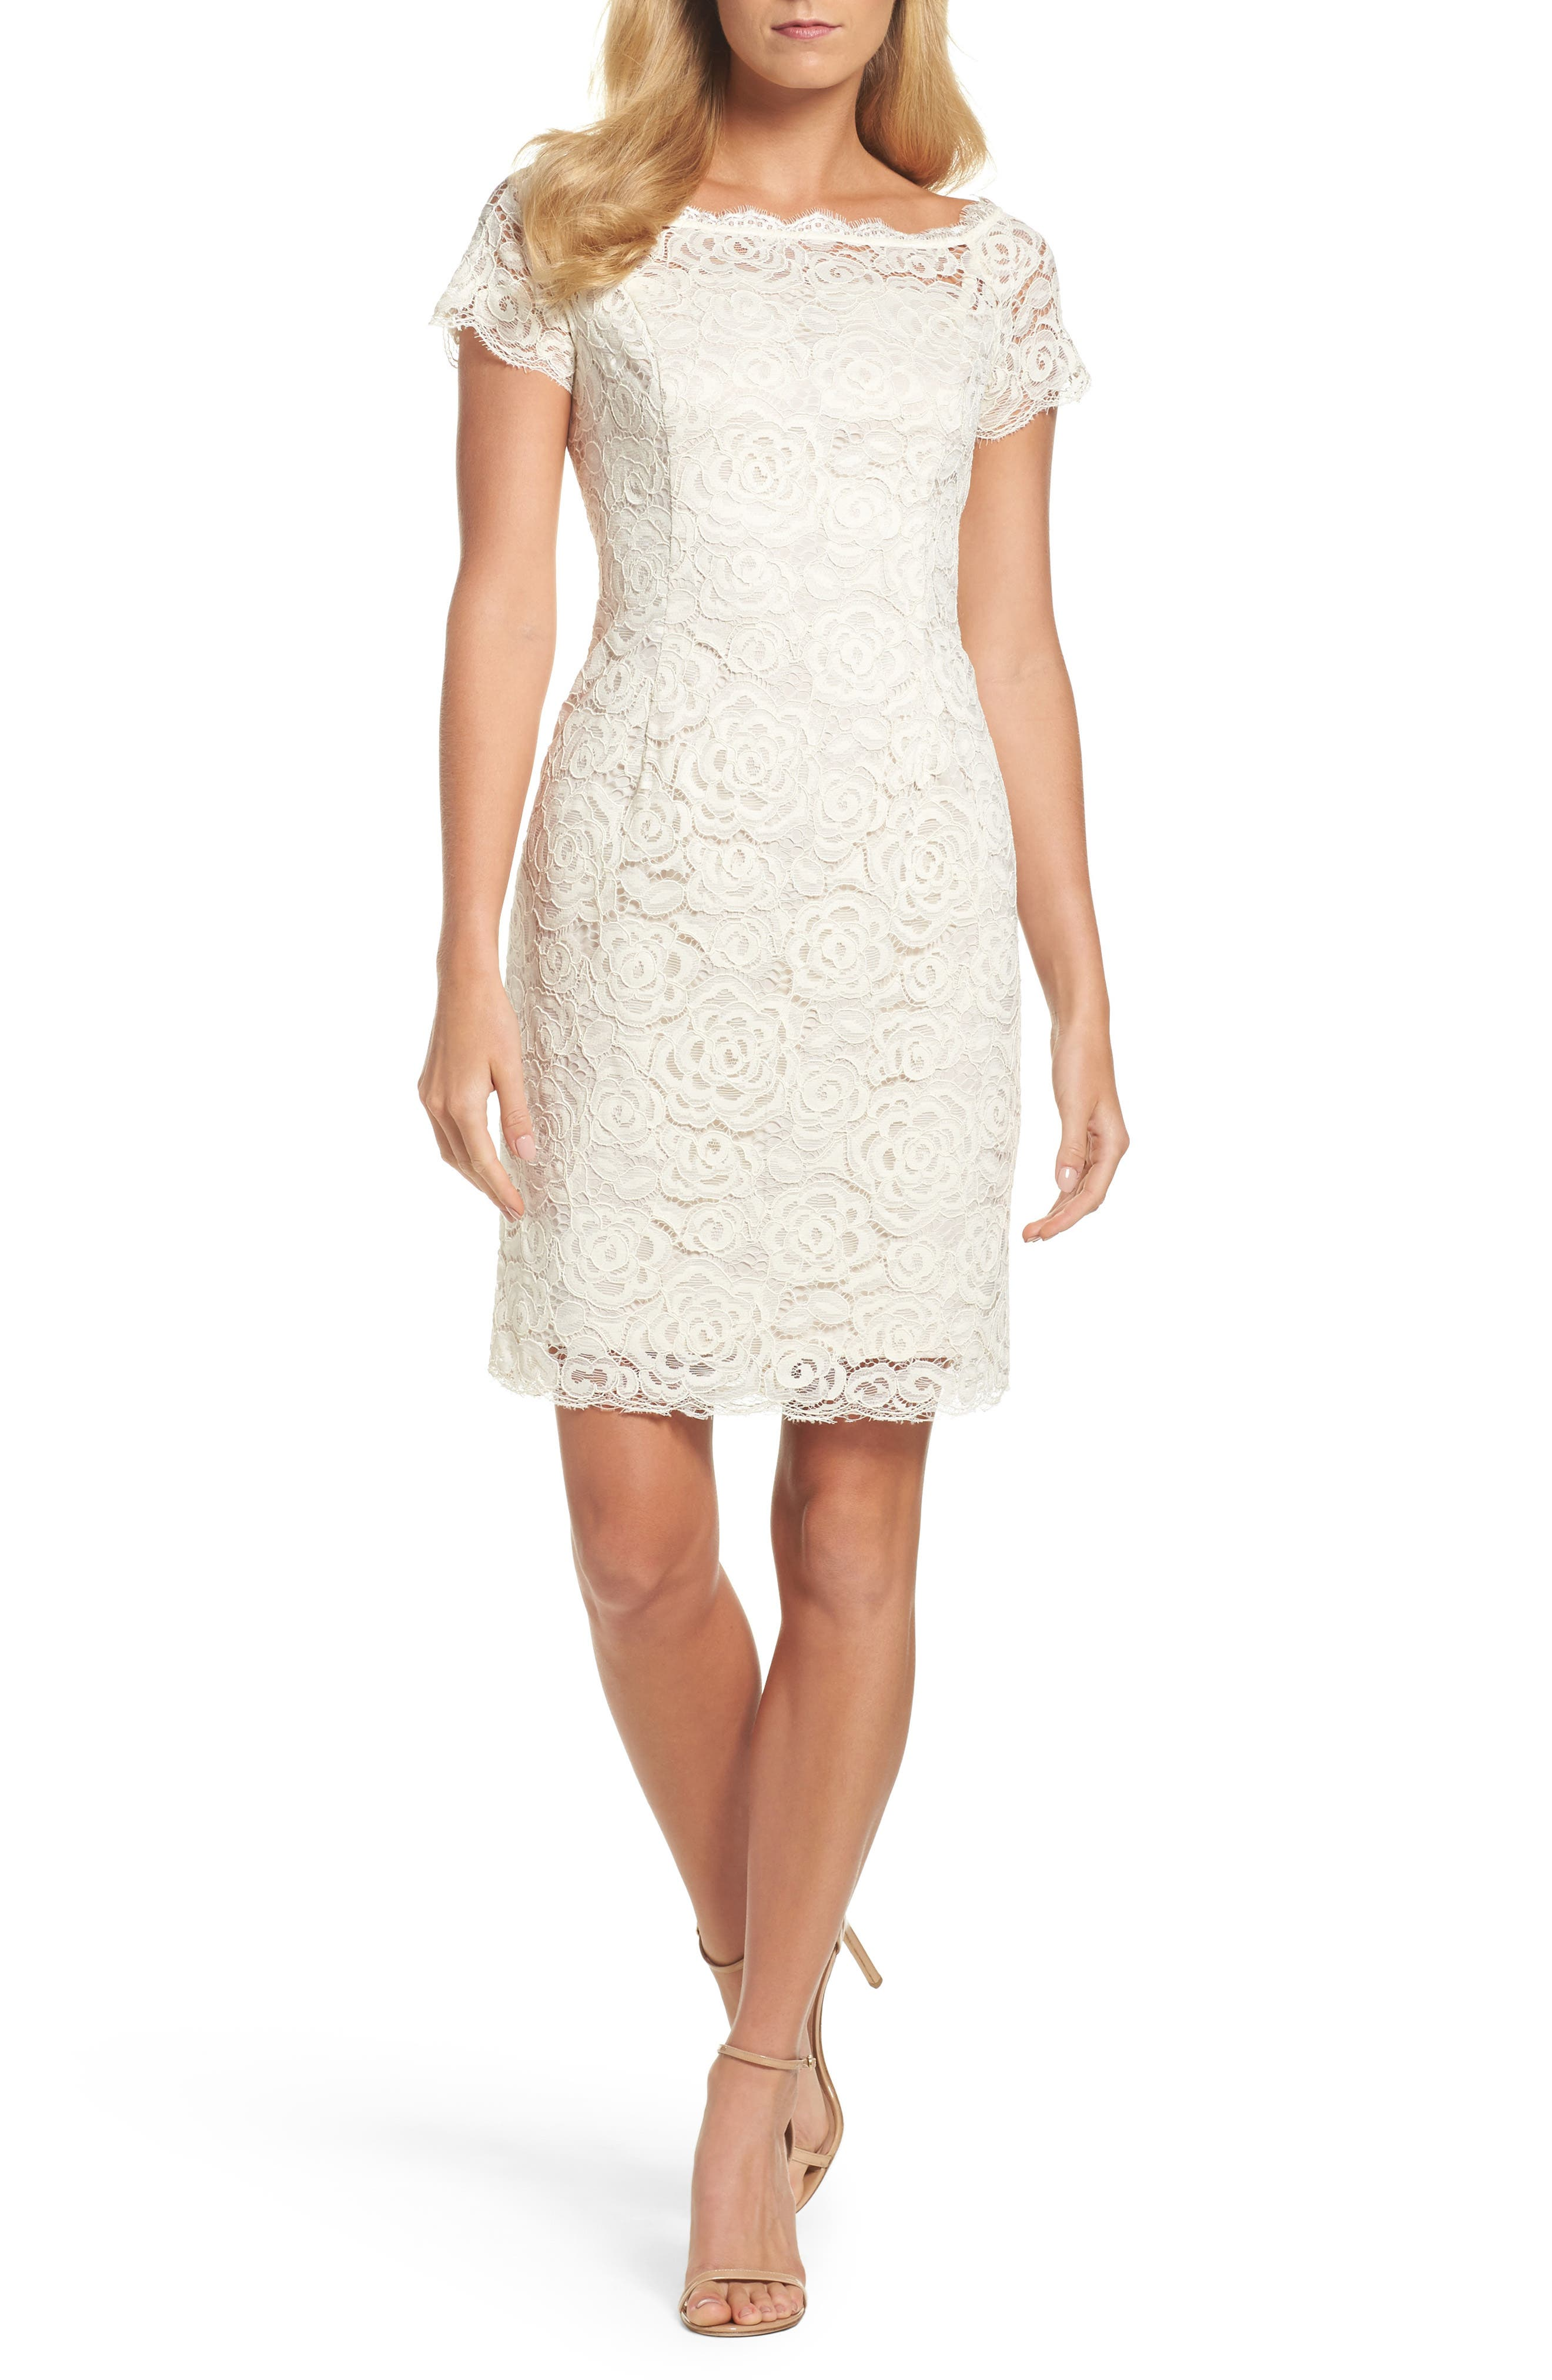 Alternate Image 1 Selected - Adrianna PapellOff the Shoulder Lace Sheath Dress (Regular & Petite)